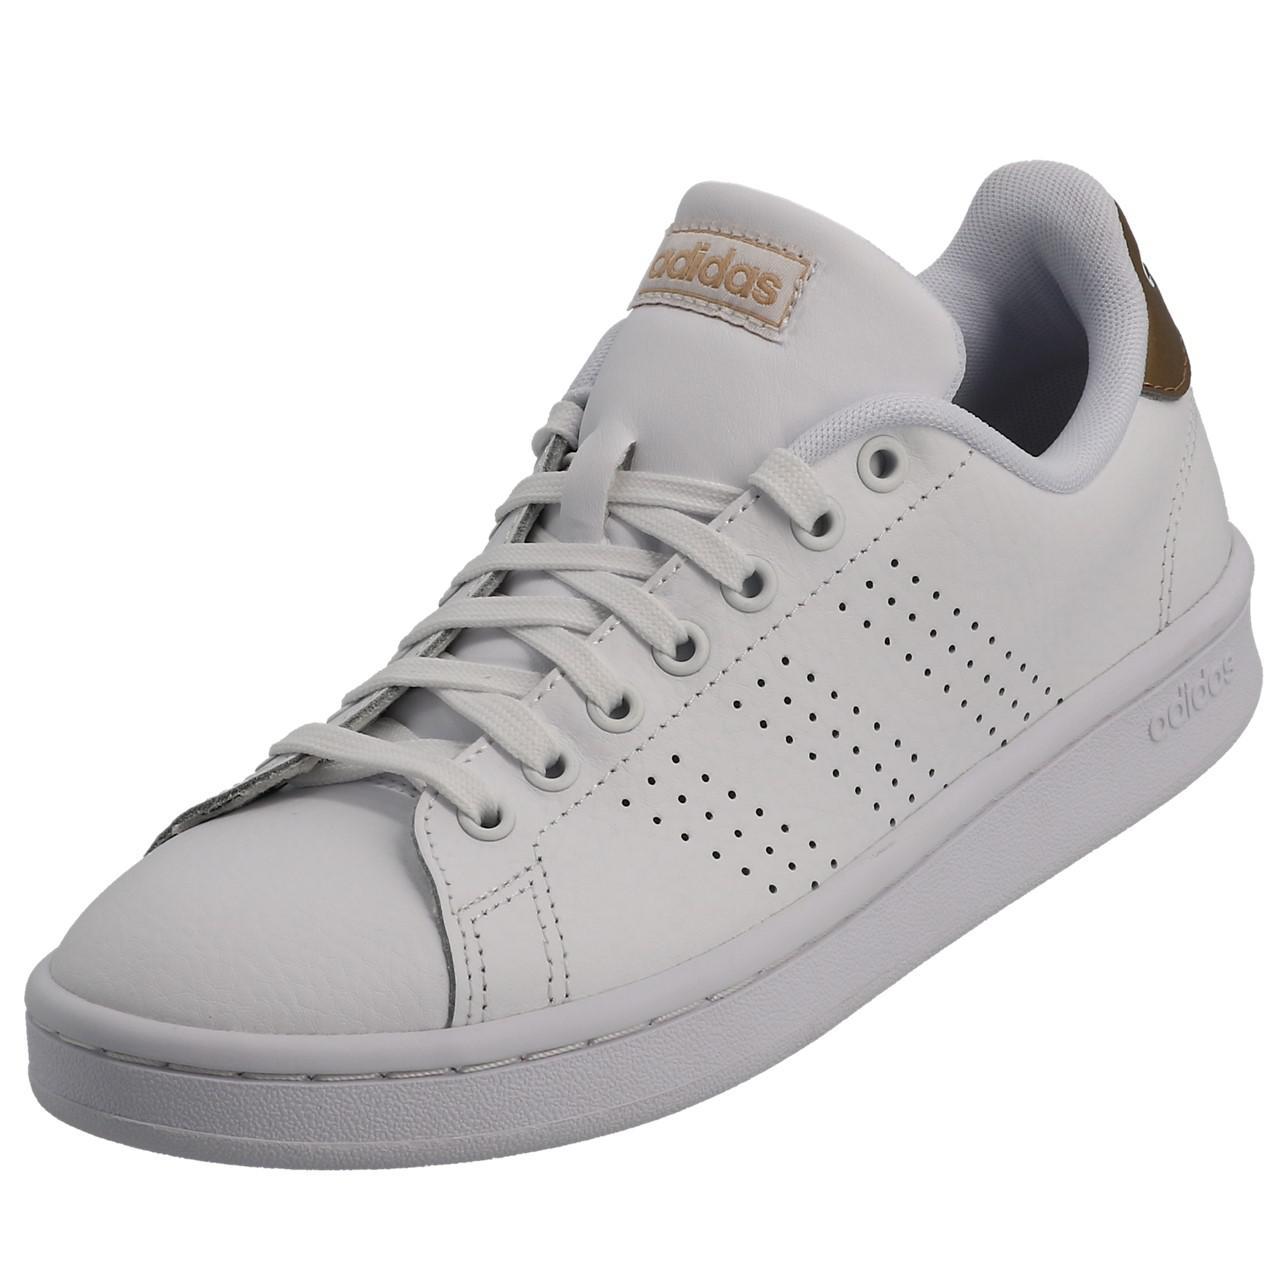 adidas chaussures ville